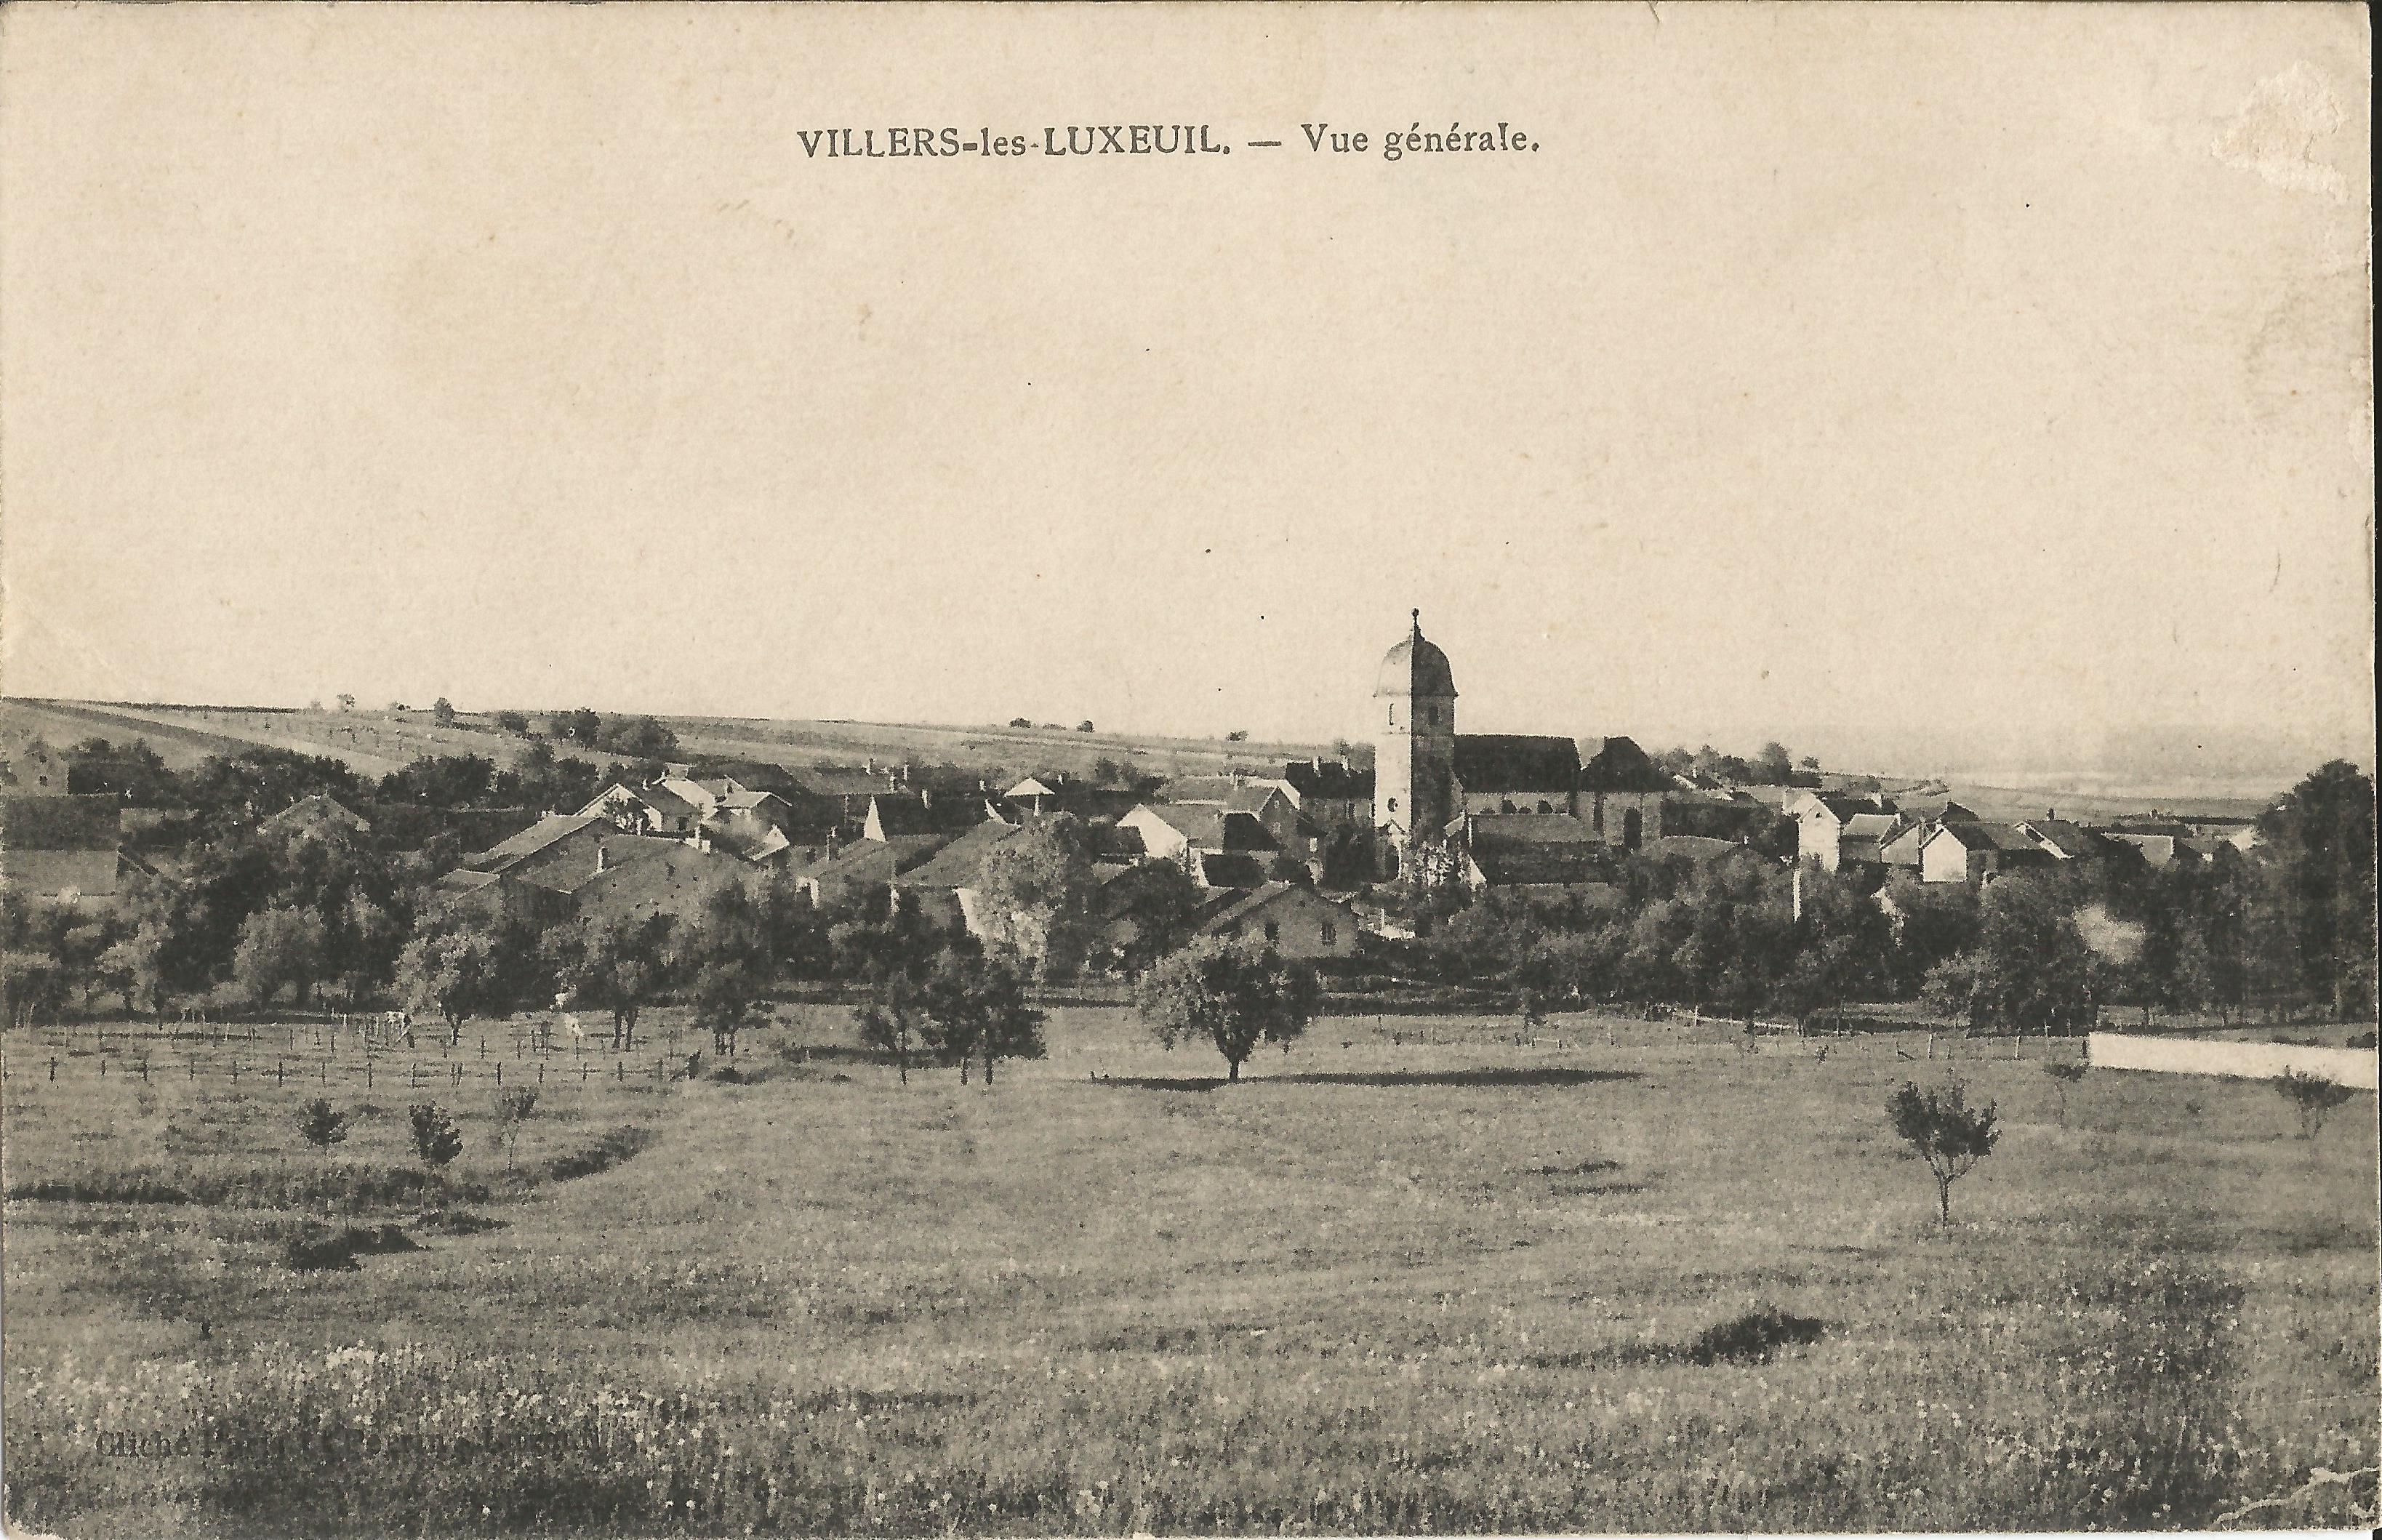 https://www.villers-les-luxeuil.com/projets/villers/files/images/Cartes_postales/General_2015/Vue_Generale_4_1942.jpg